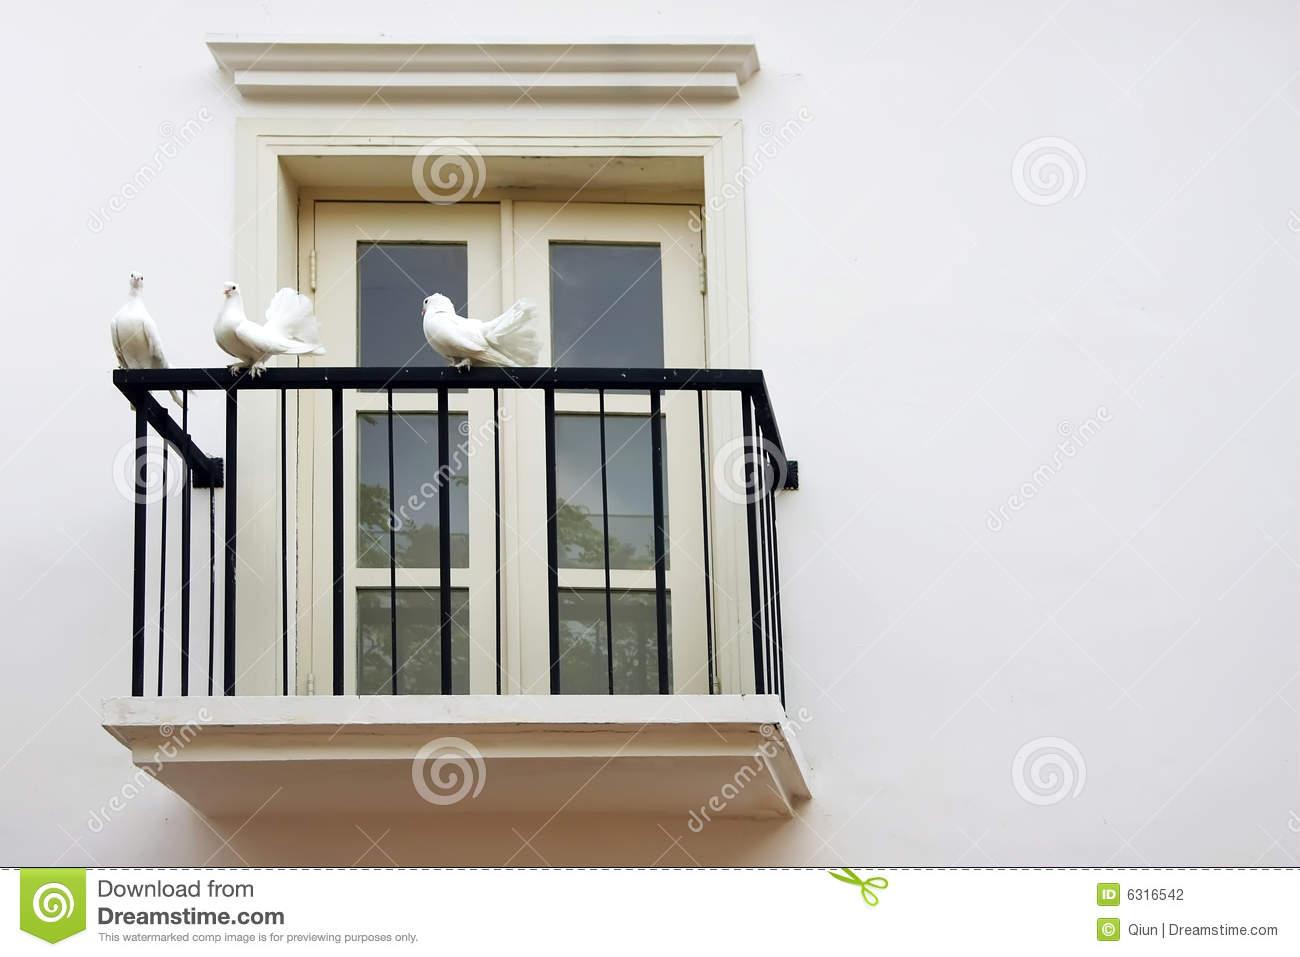 Balconies Window Clip Art, Three Dove At Balcony Windows Stock.